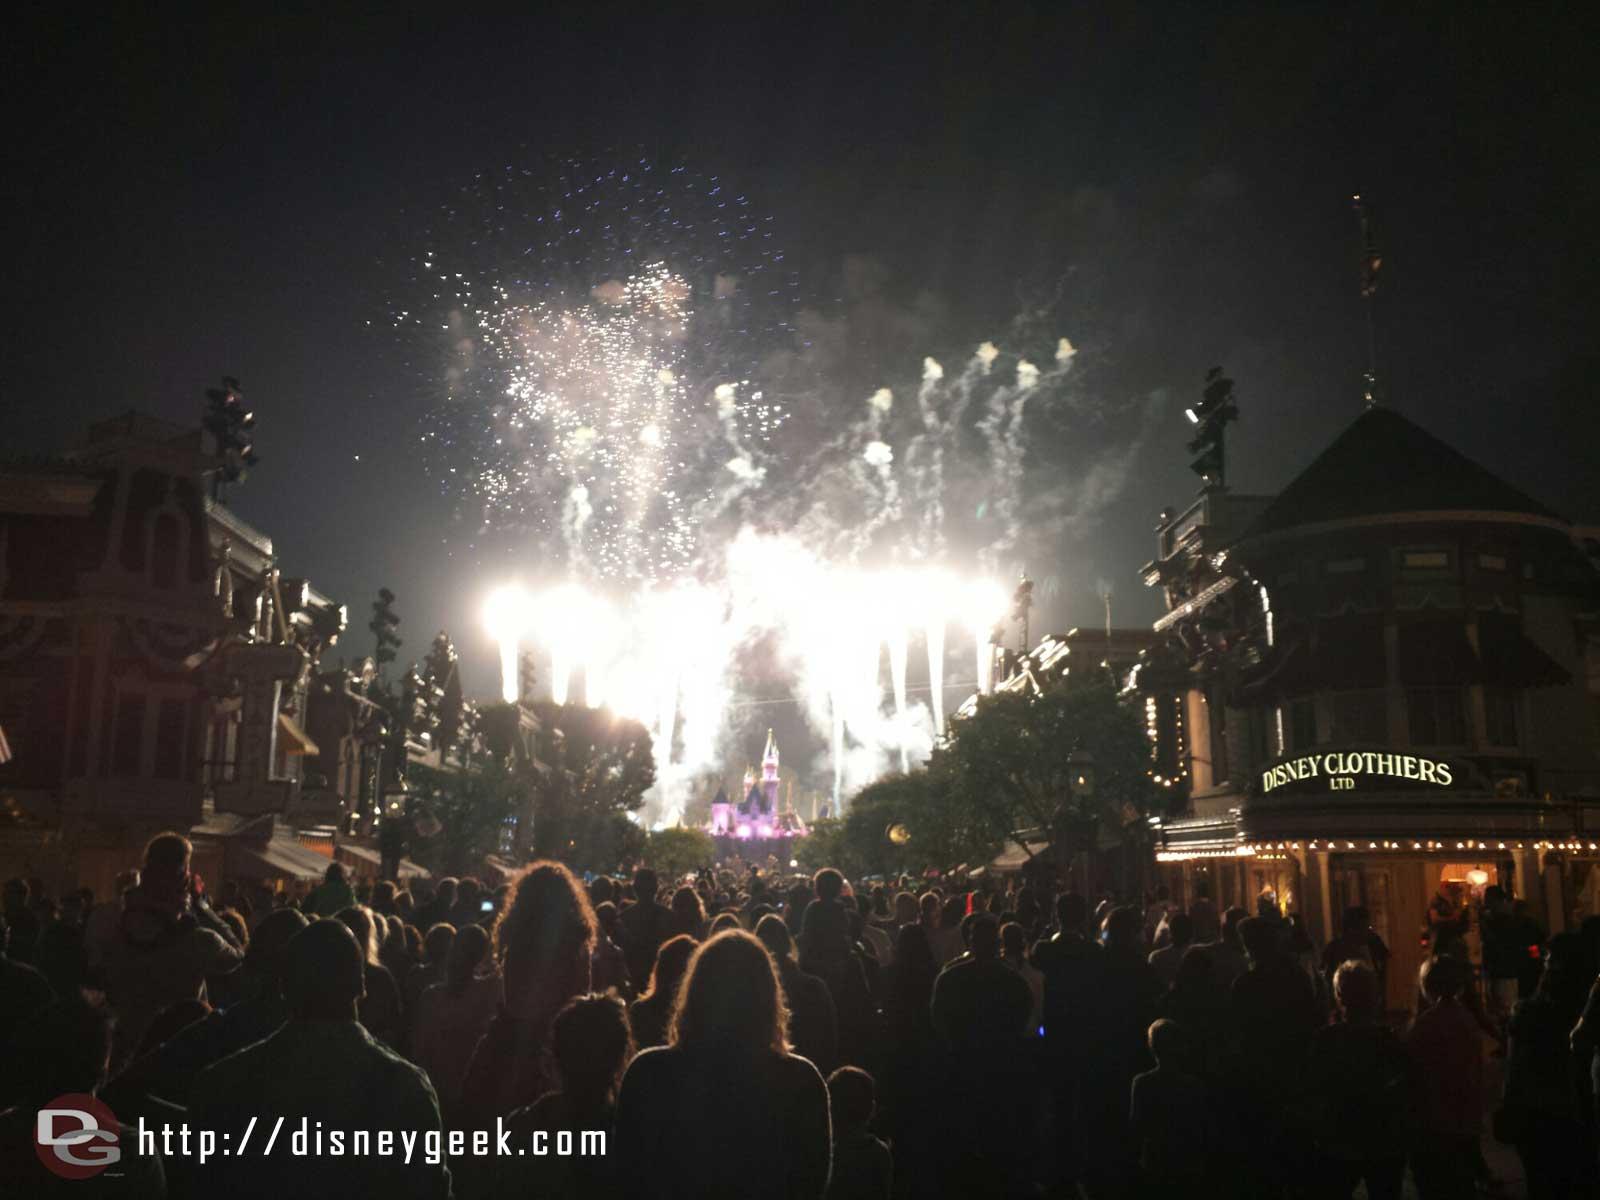 Magical finale #Disneyland